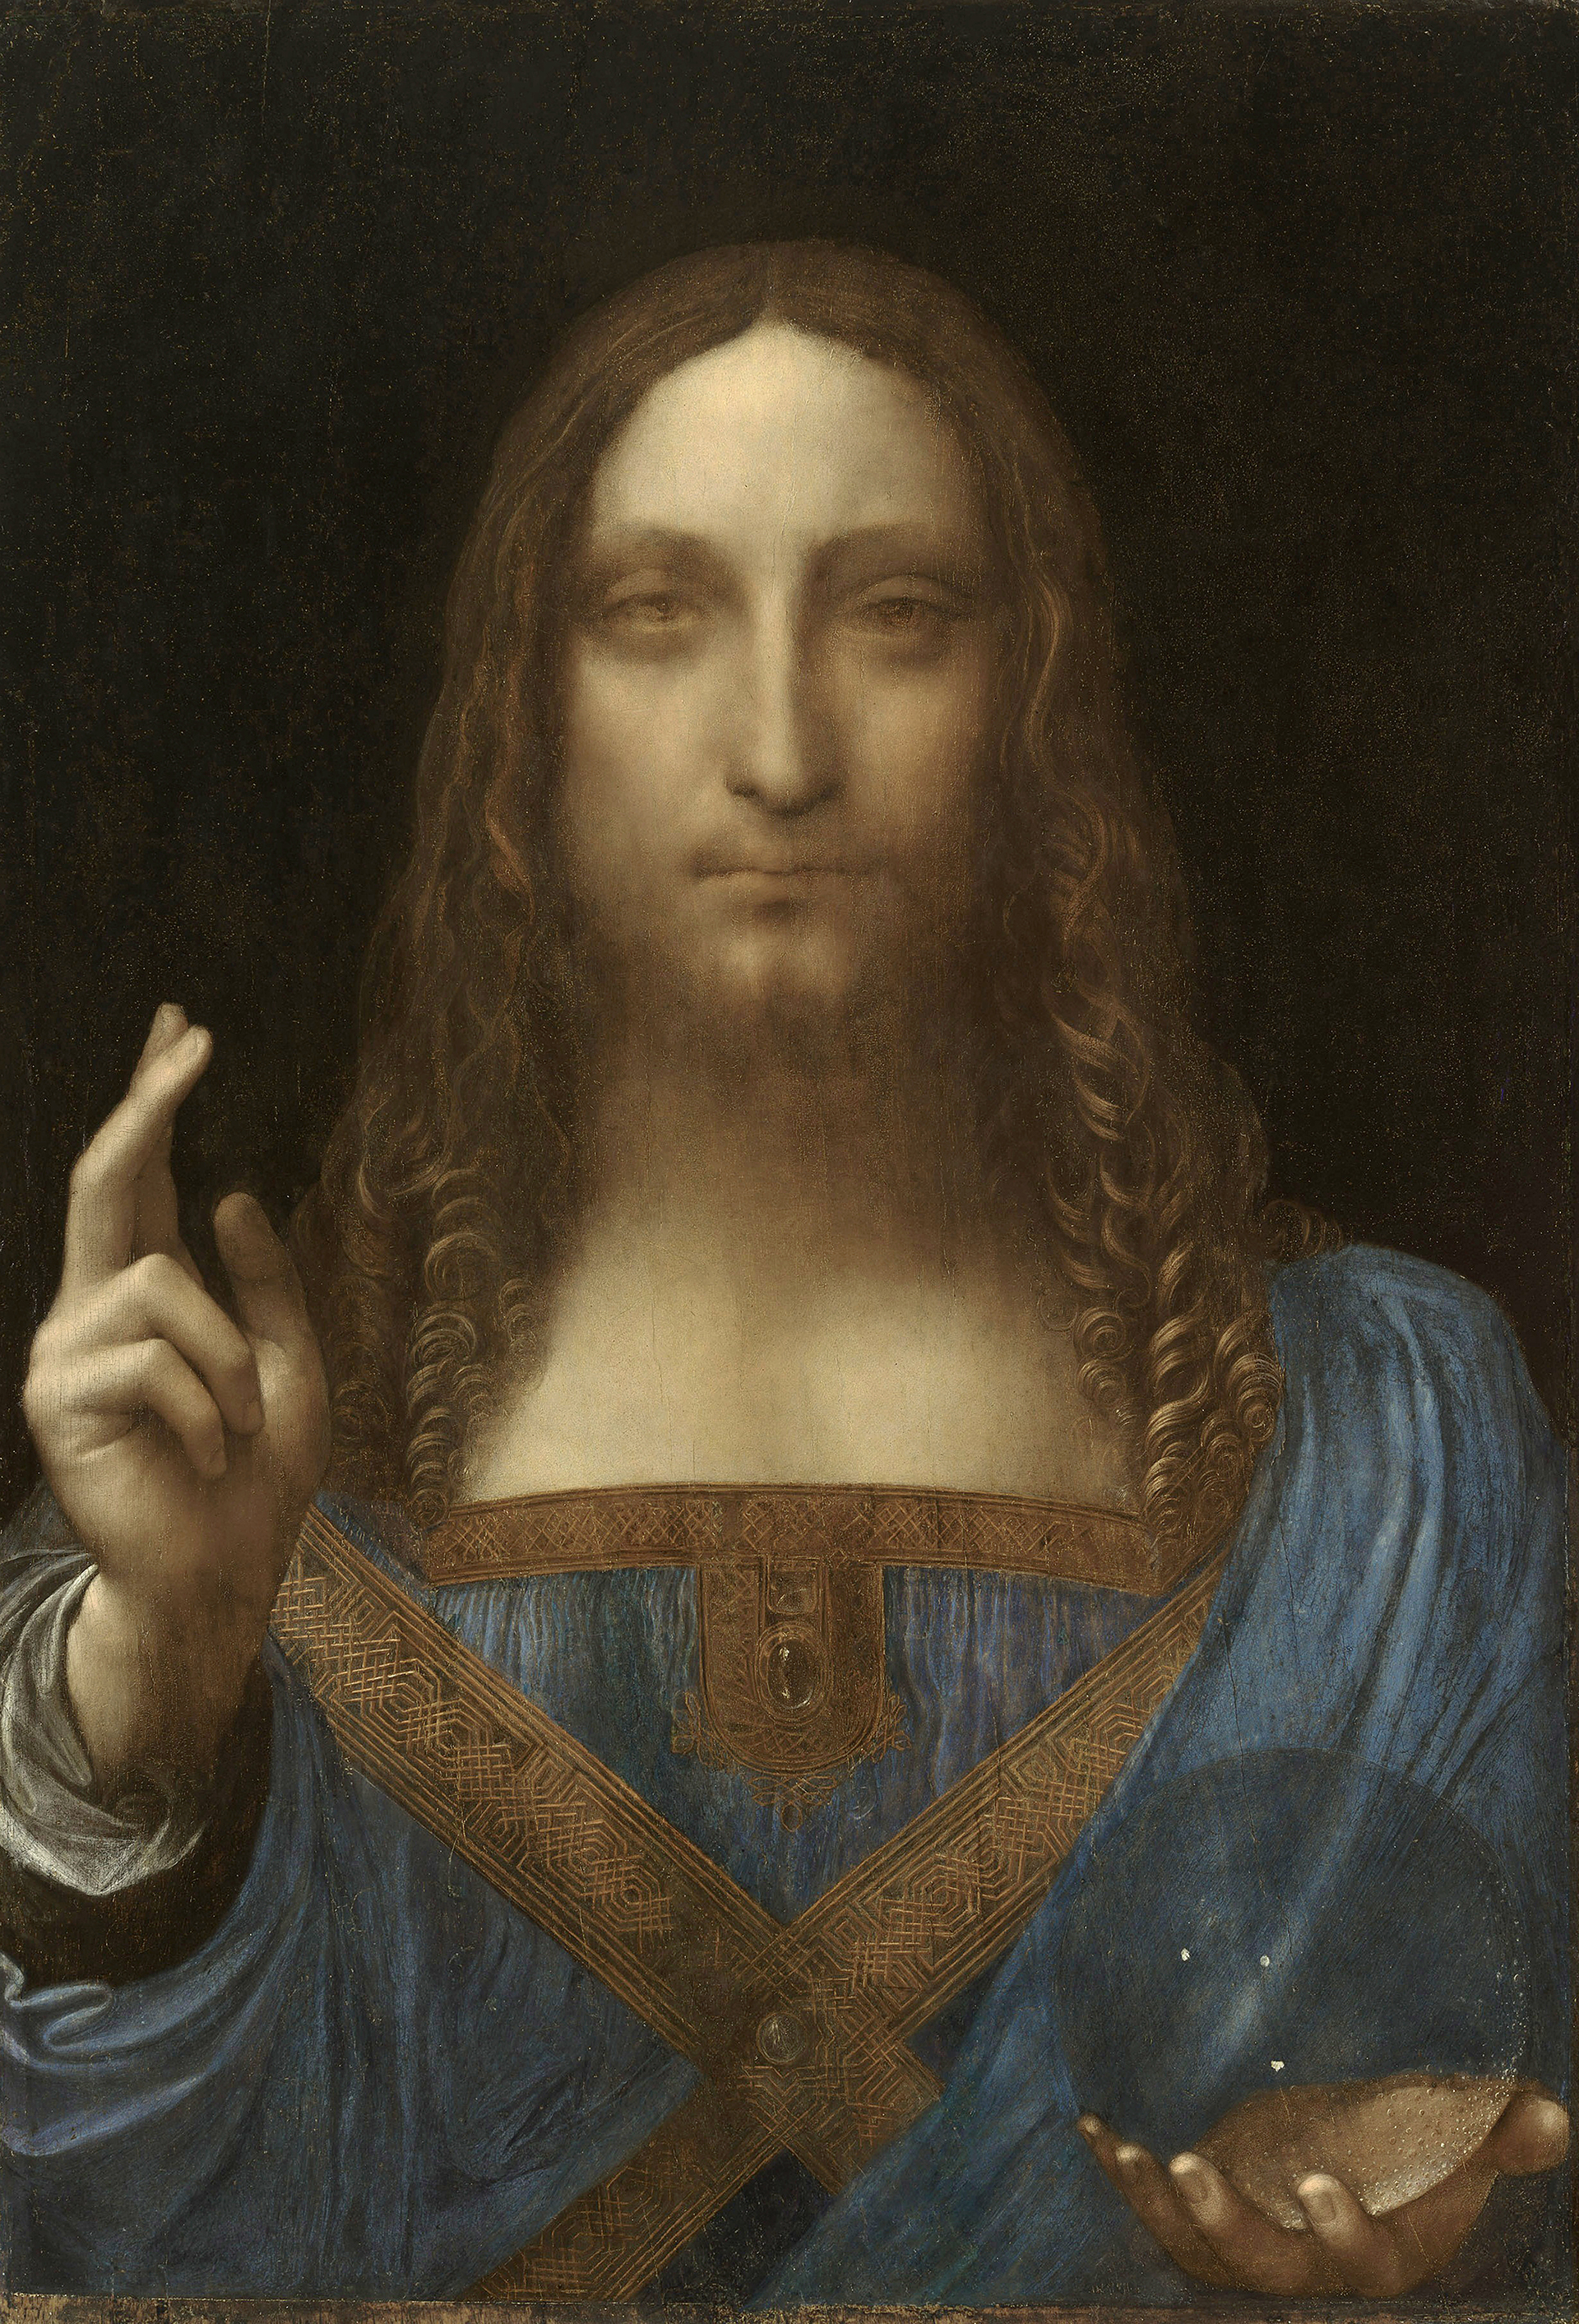 Salvator Mundi painting by Leonardo da Vinci. (Credit: VCG Wilson/Corbis via Getty Images)